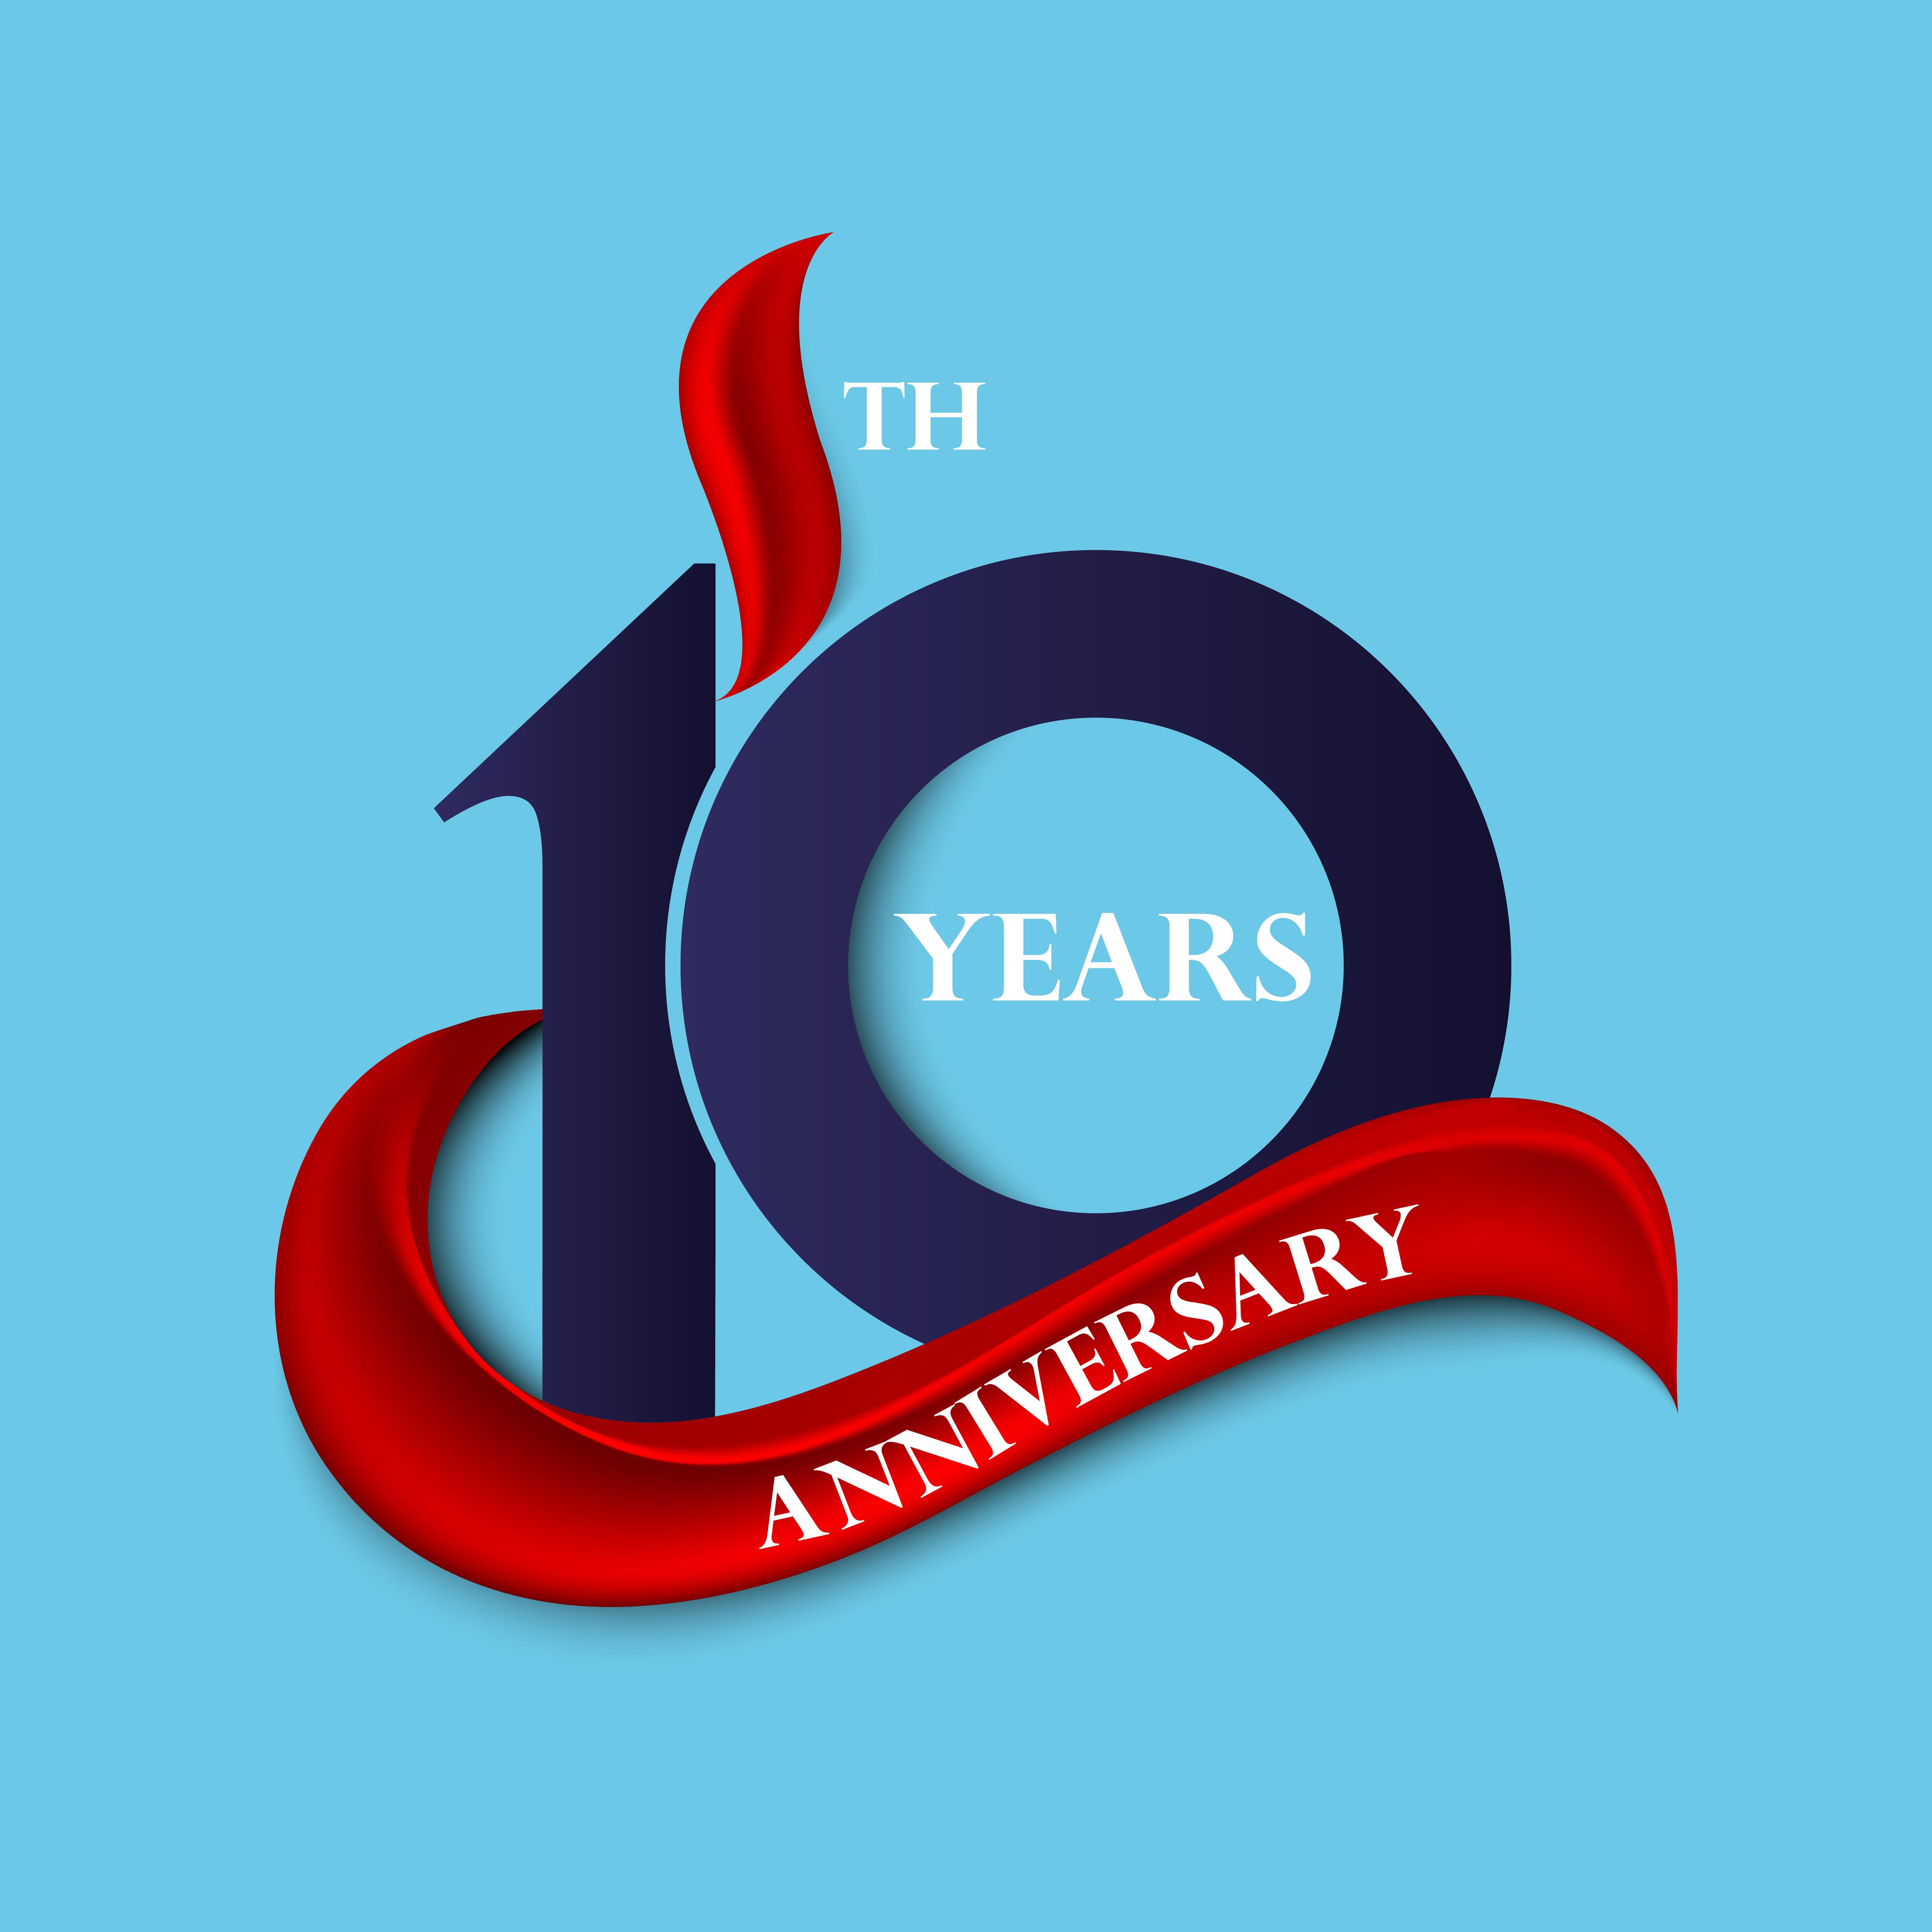 10th Anniversary Business Celebration Ideas | Oxynux.Org